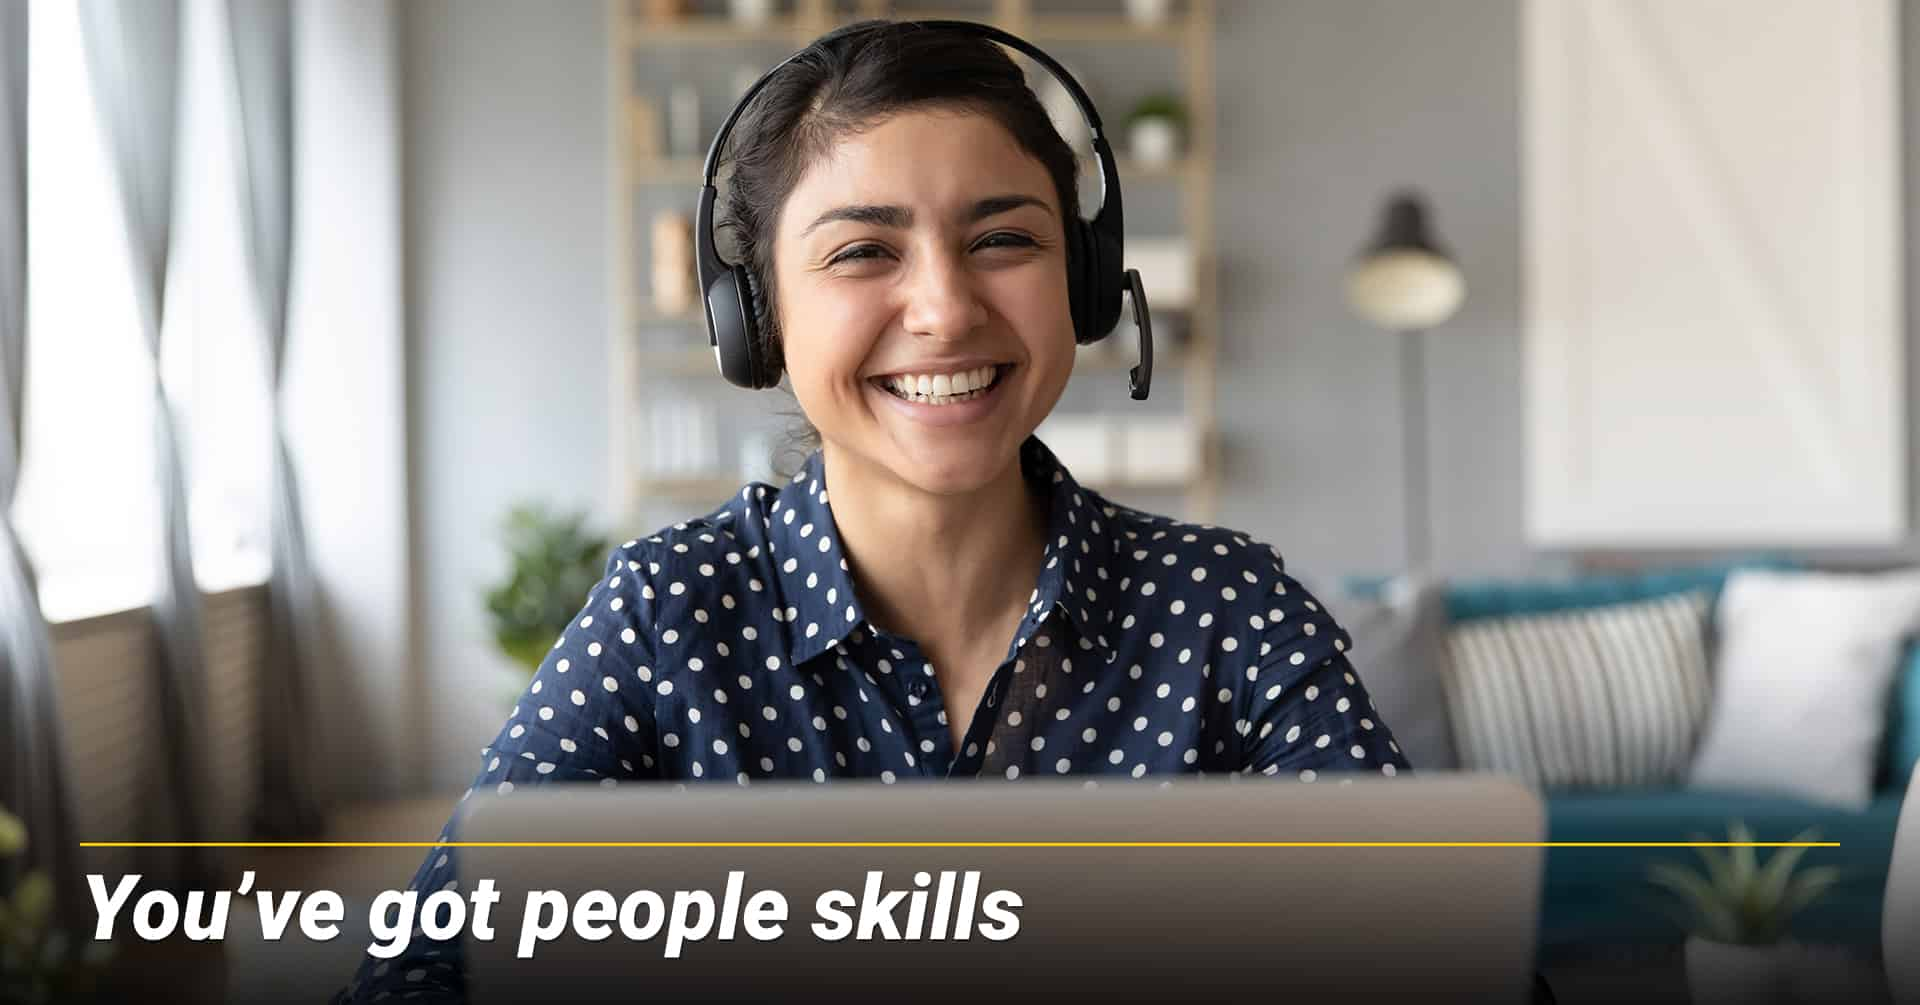 You've got people skills